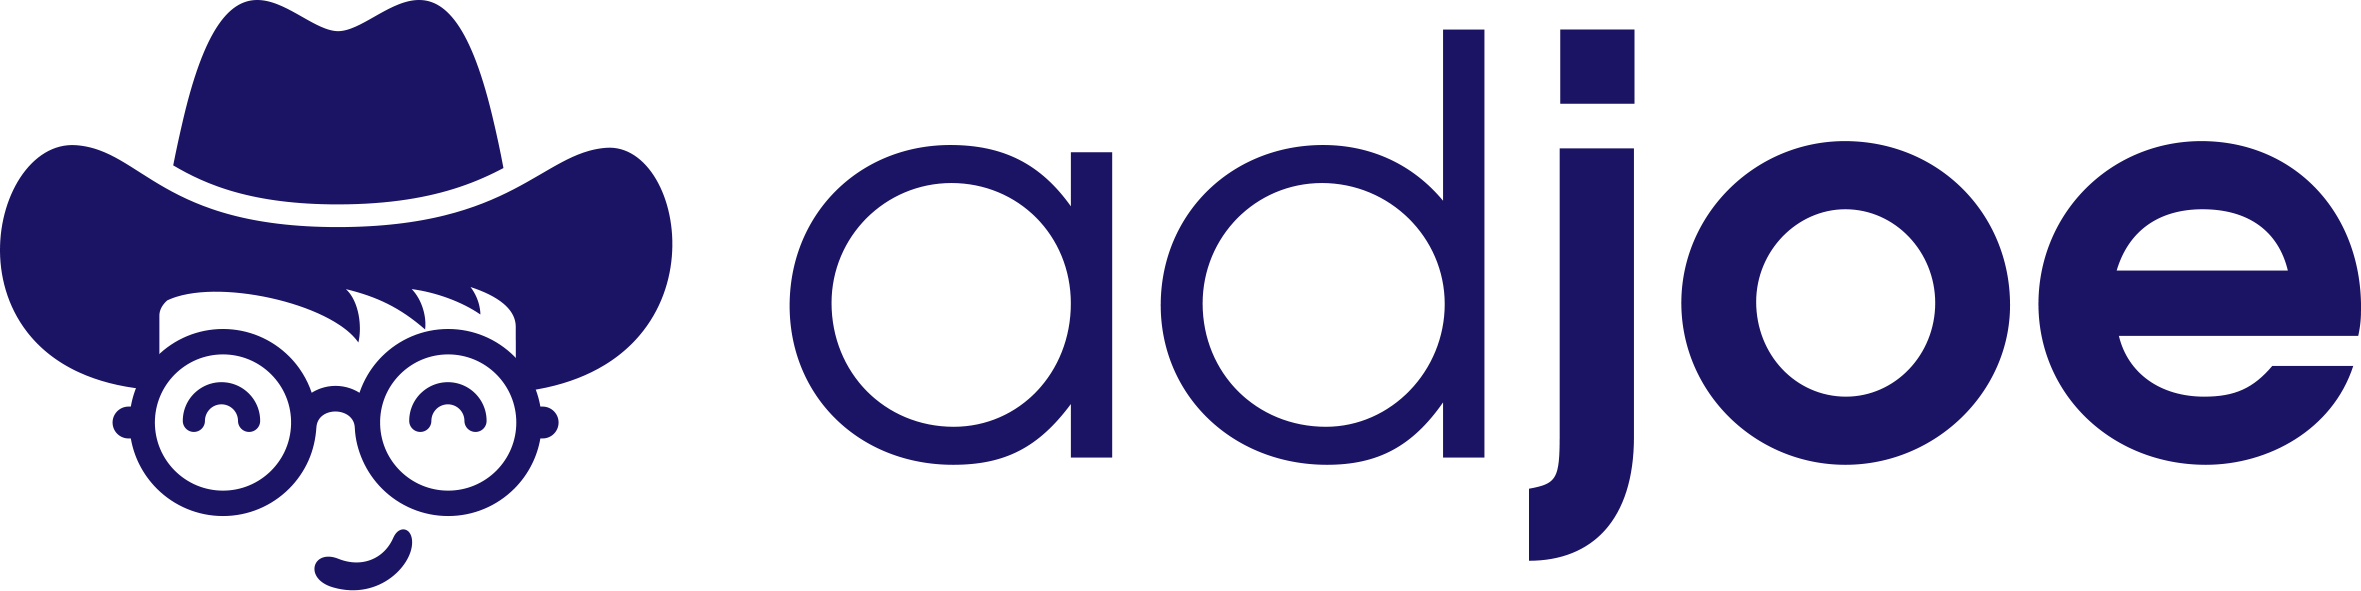 adjoe_logo.png